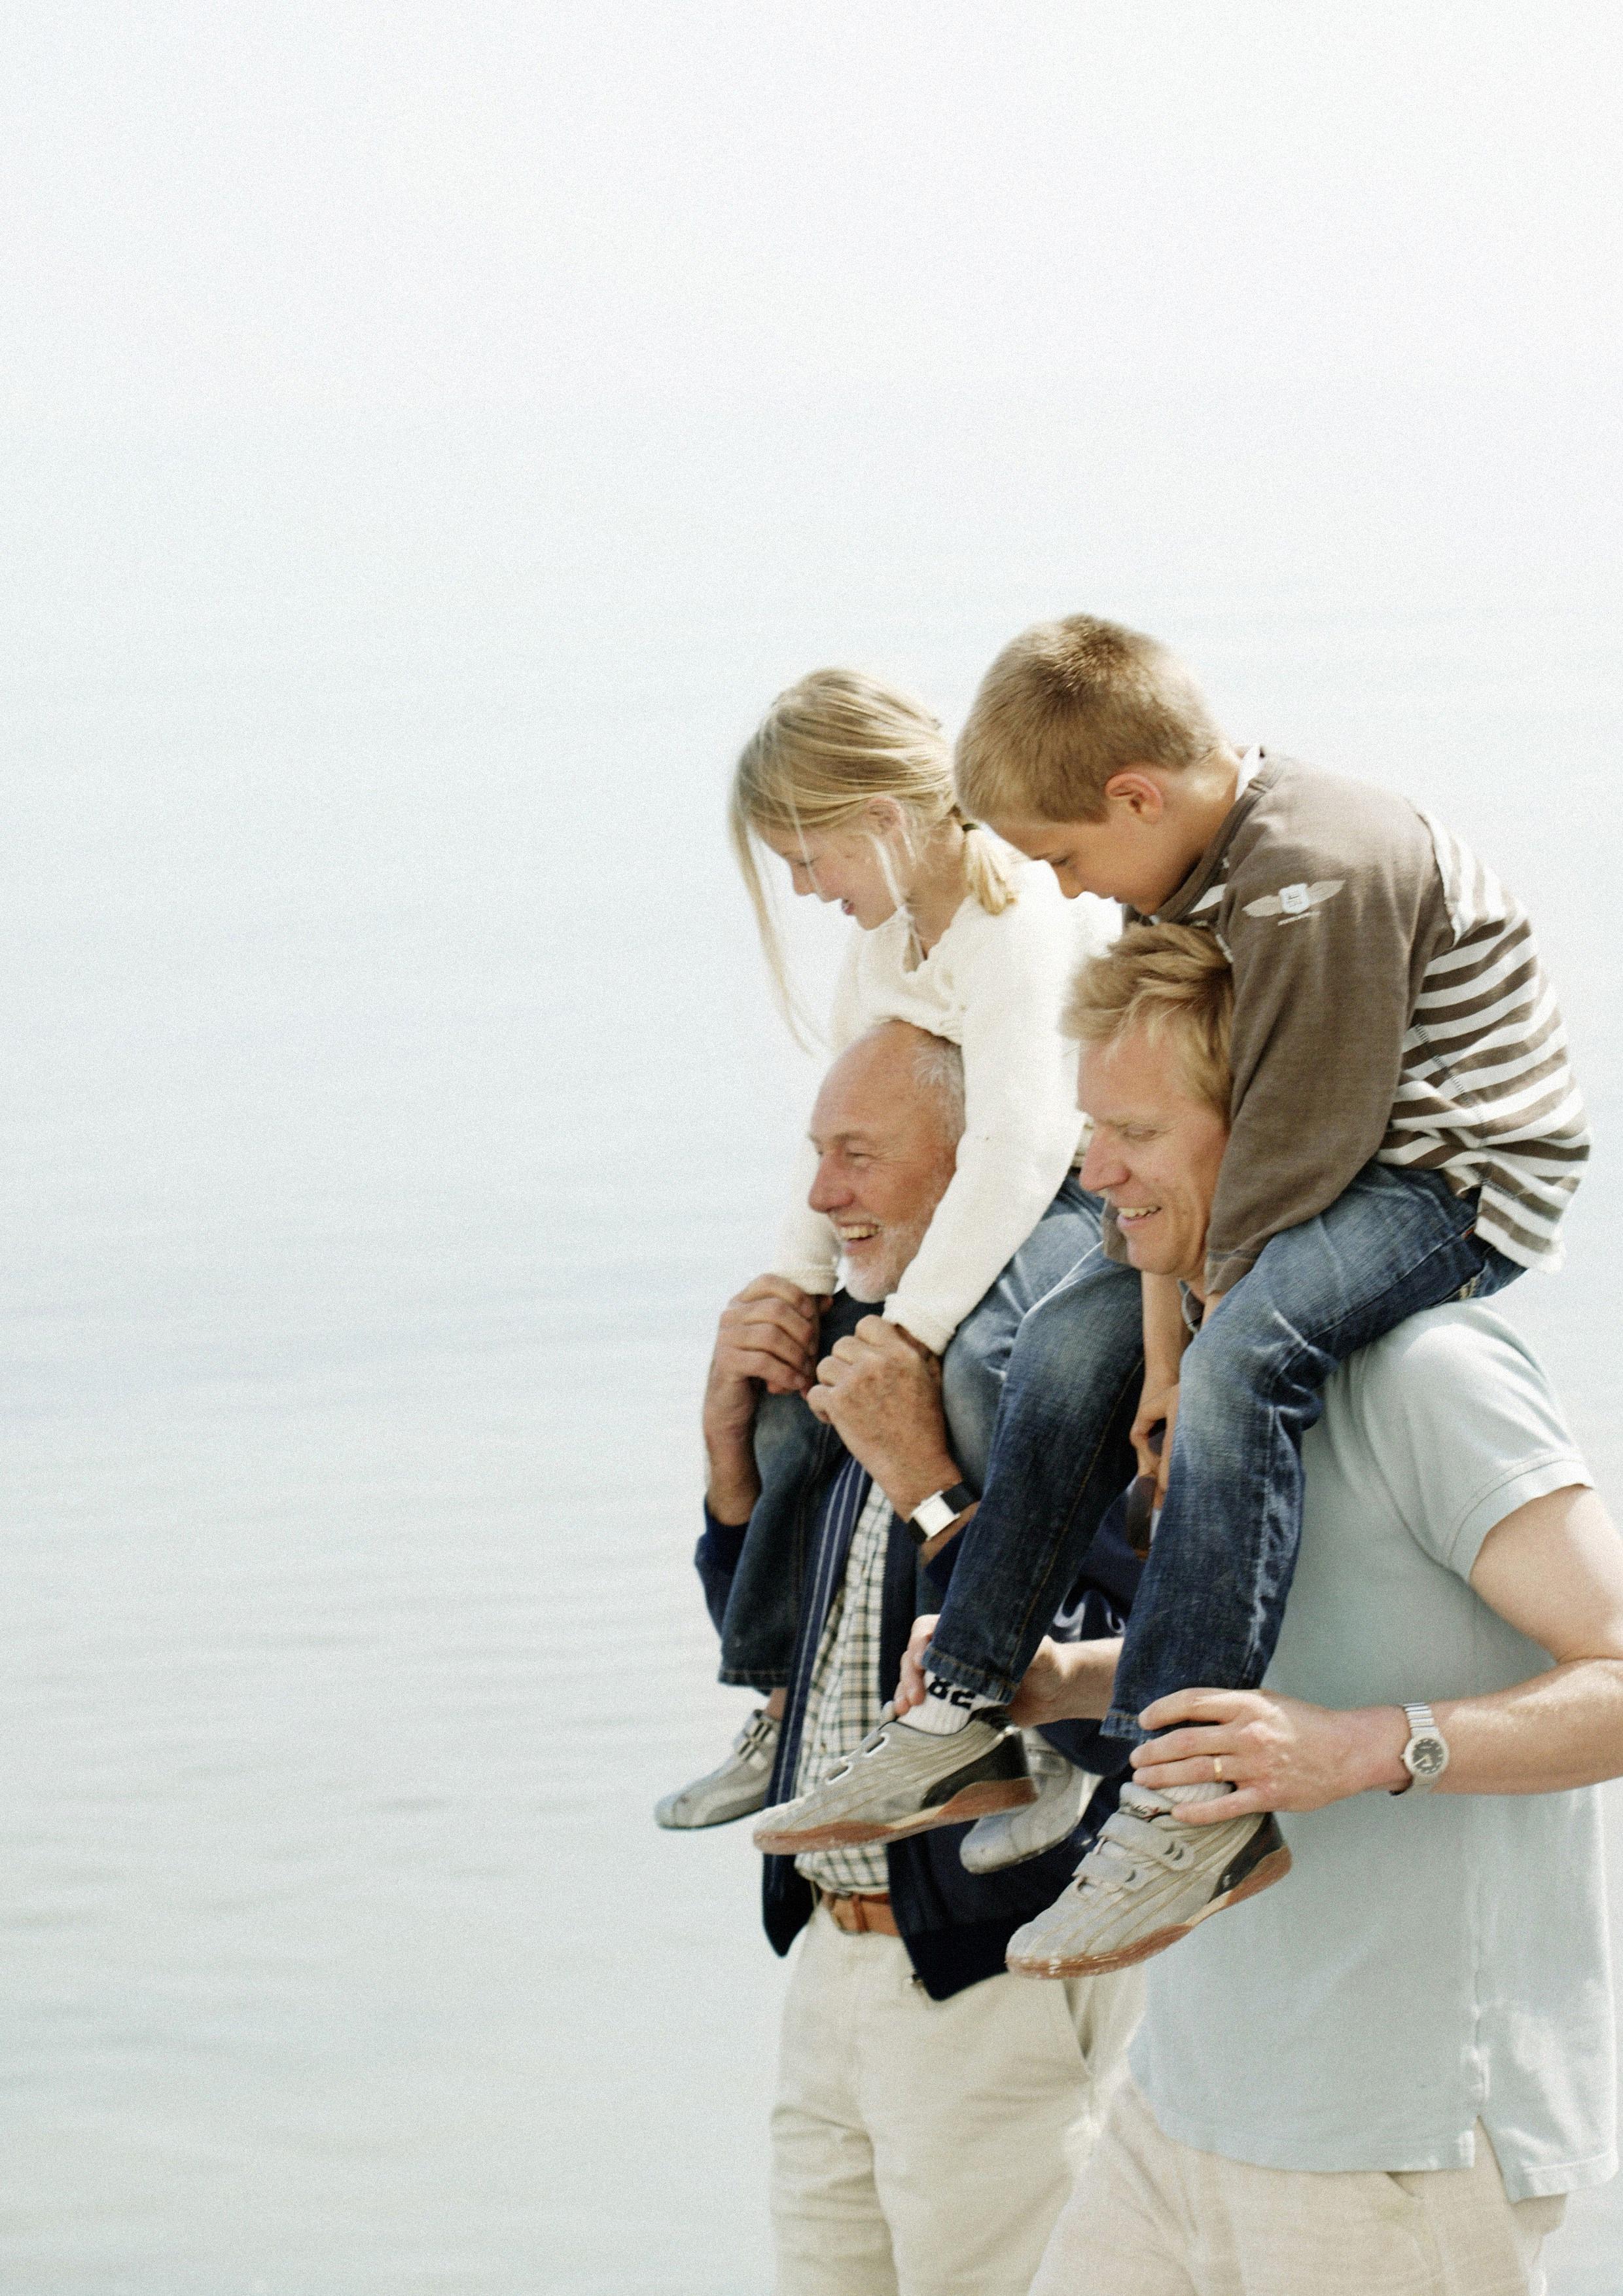 father-grandfather-children.jpg